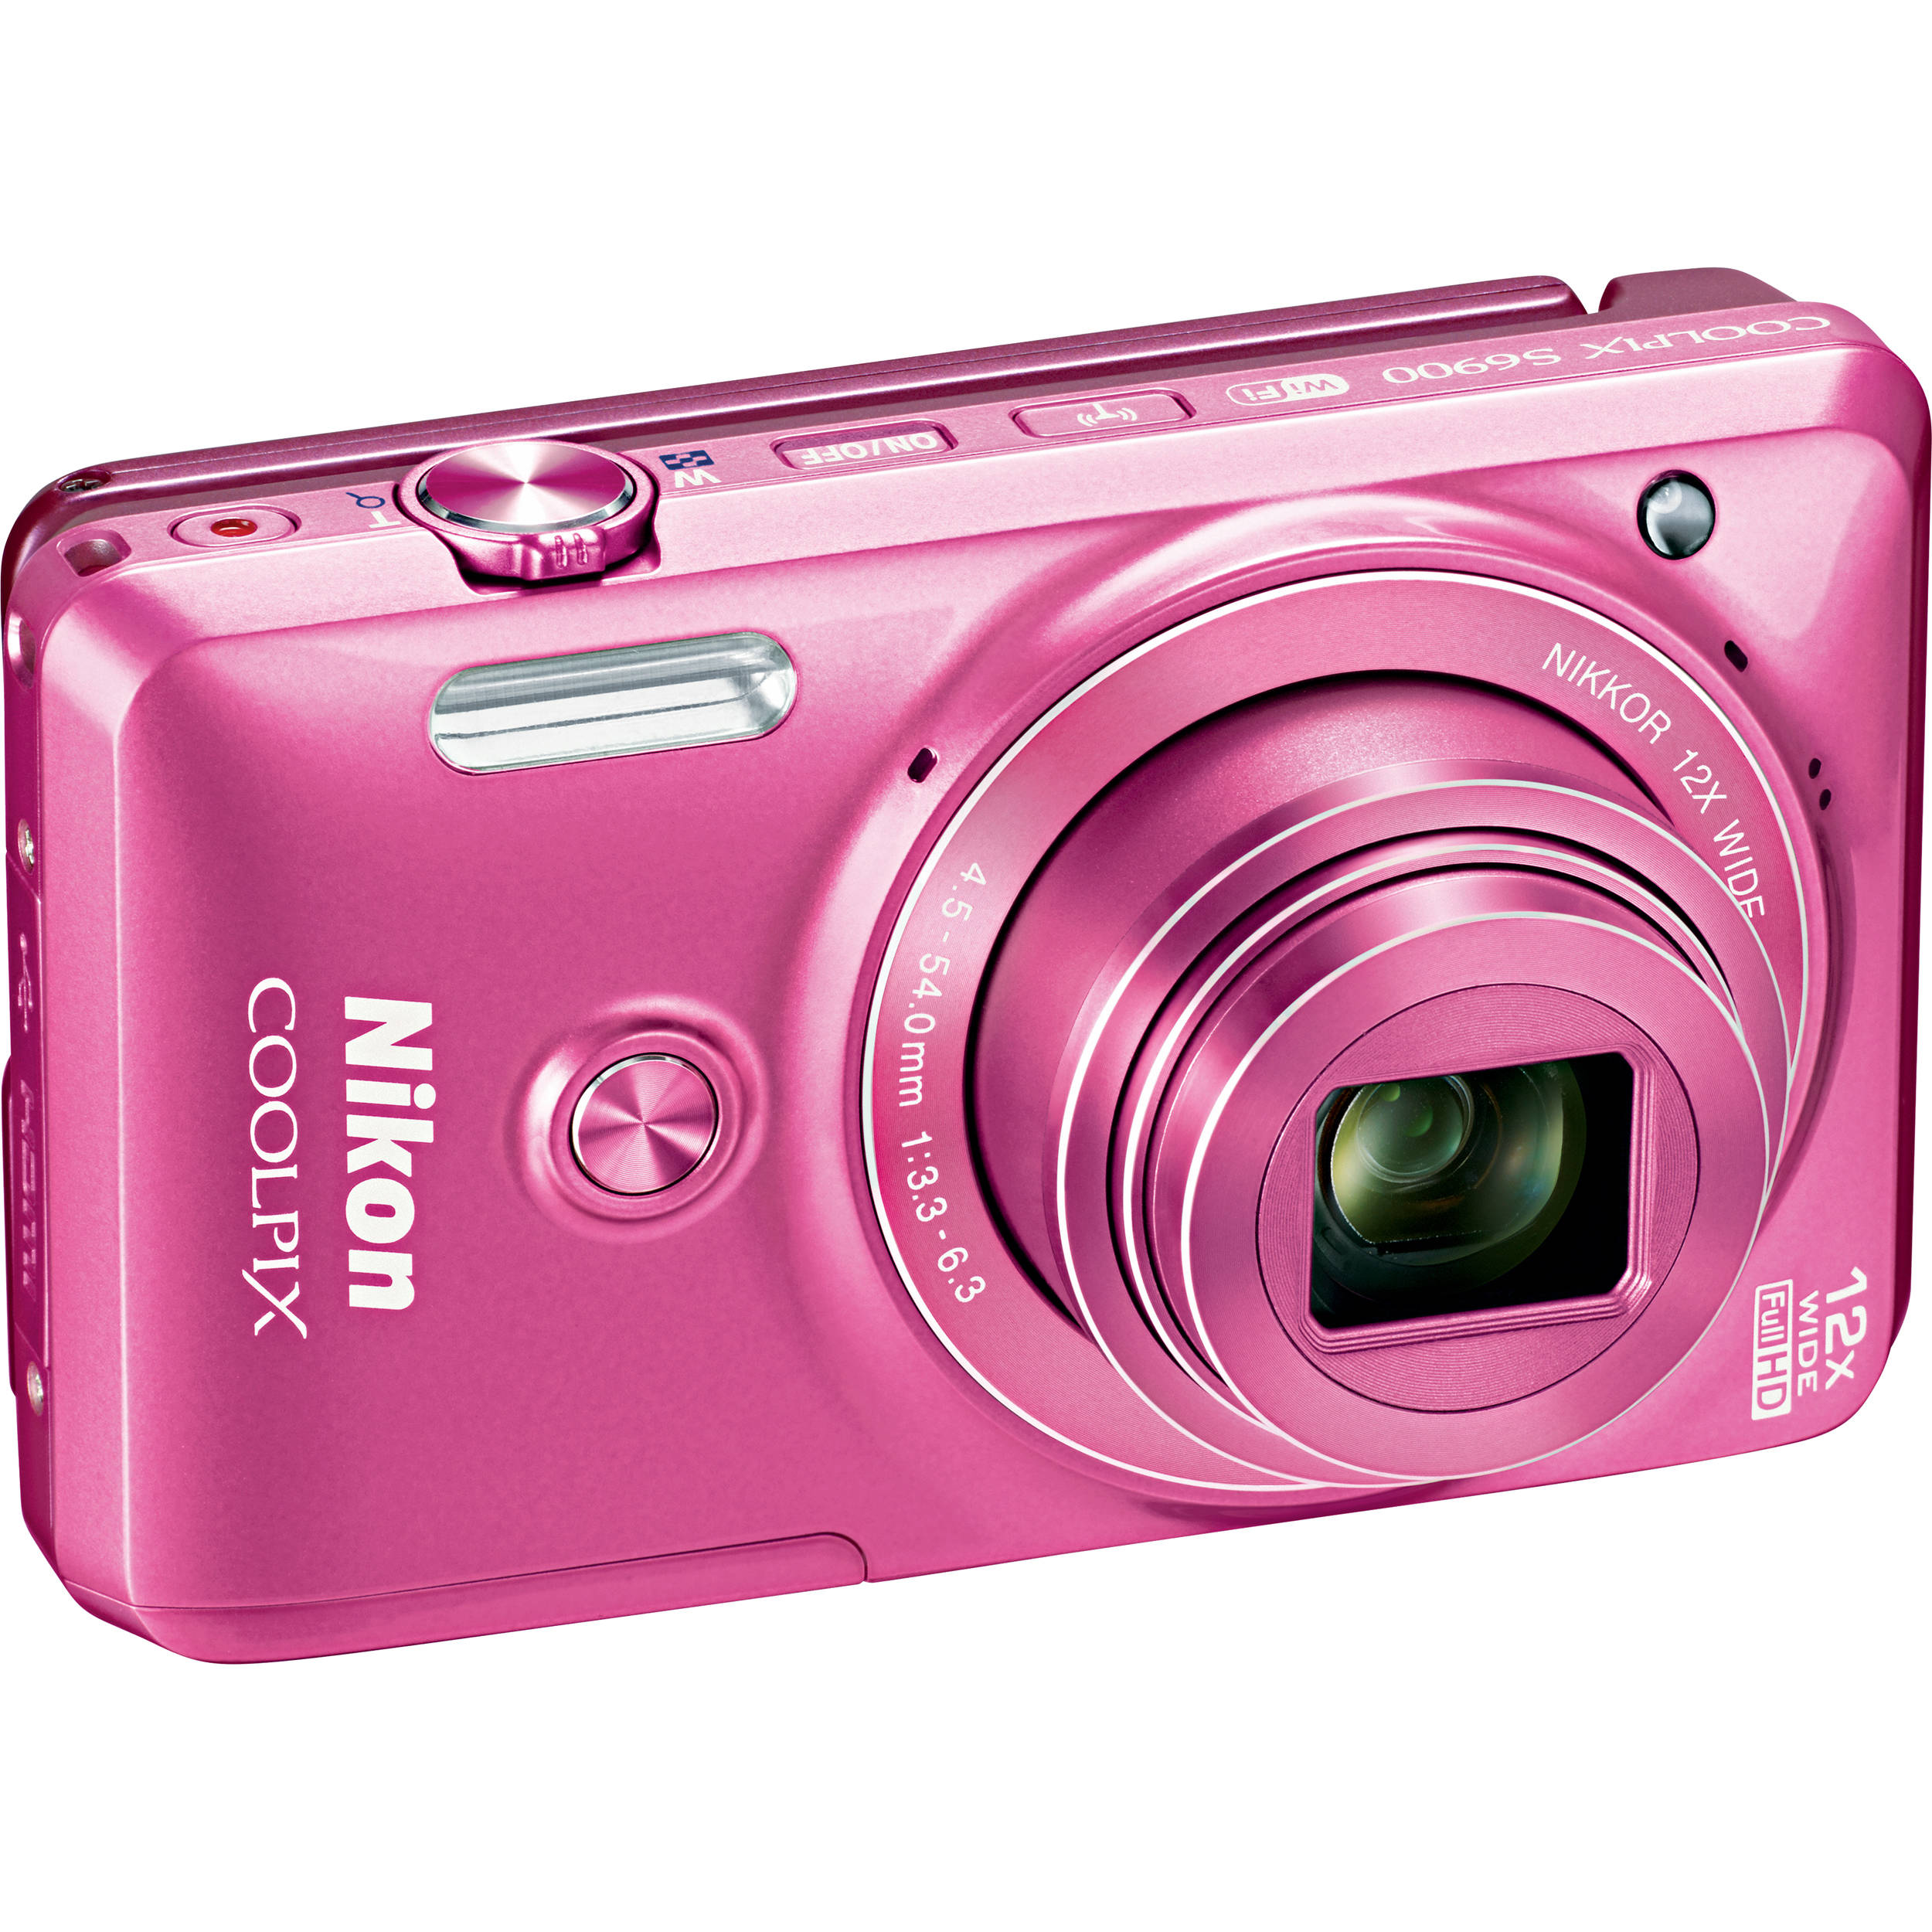 Nikon COOLPIX S6900 Digital Camera (Pink) 26474 B&H Photo